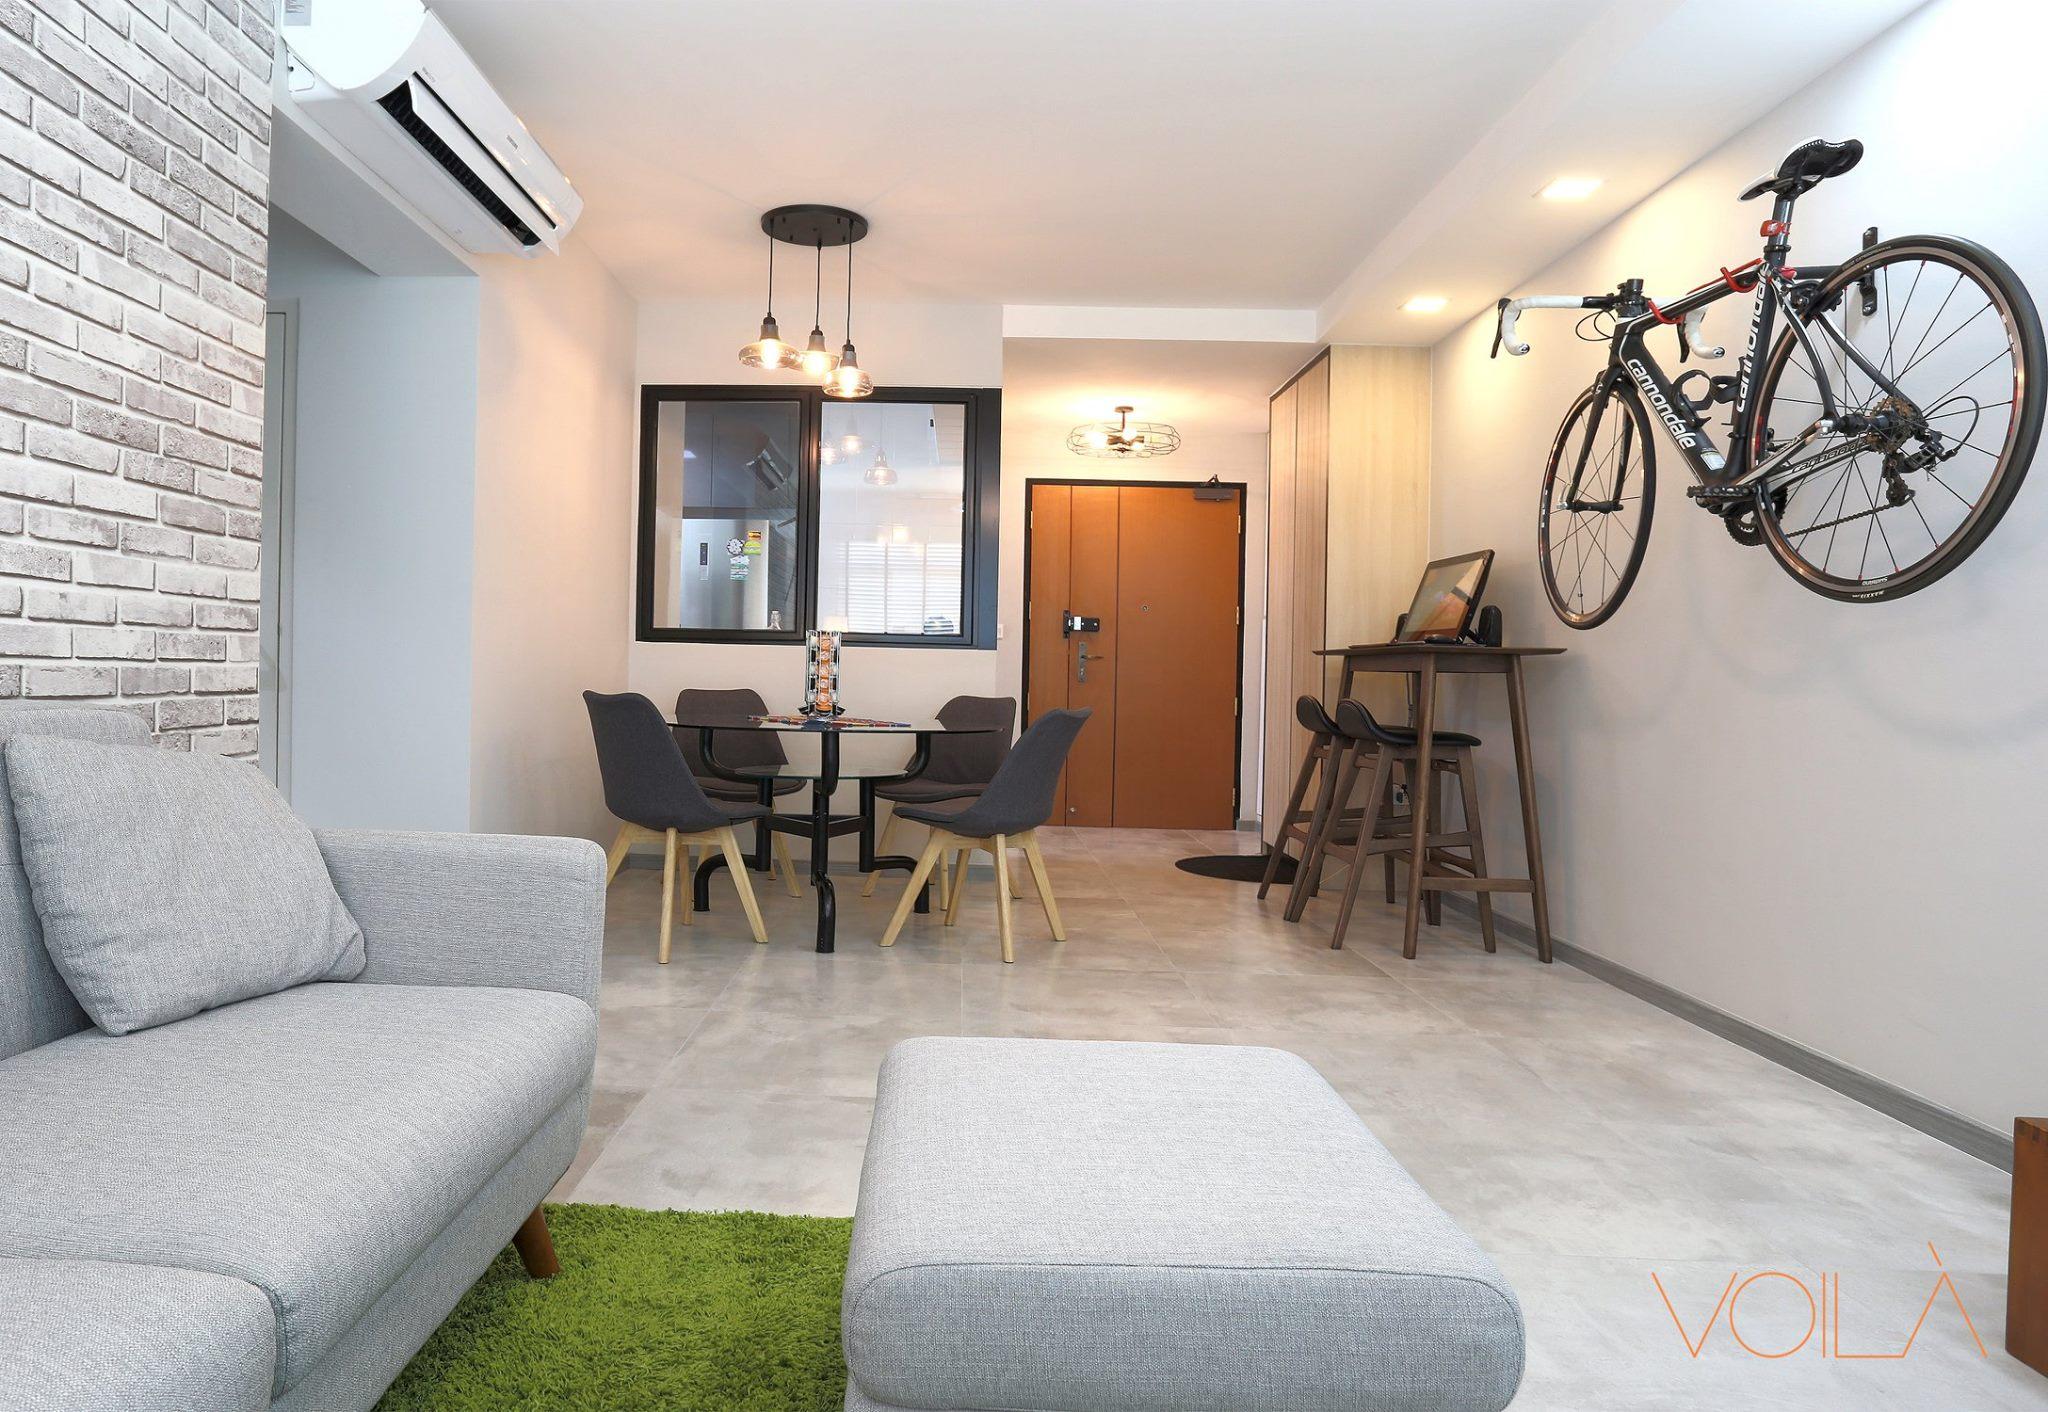 One Word To Describe This Scandinavian Interior Design Chic